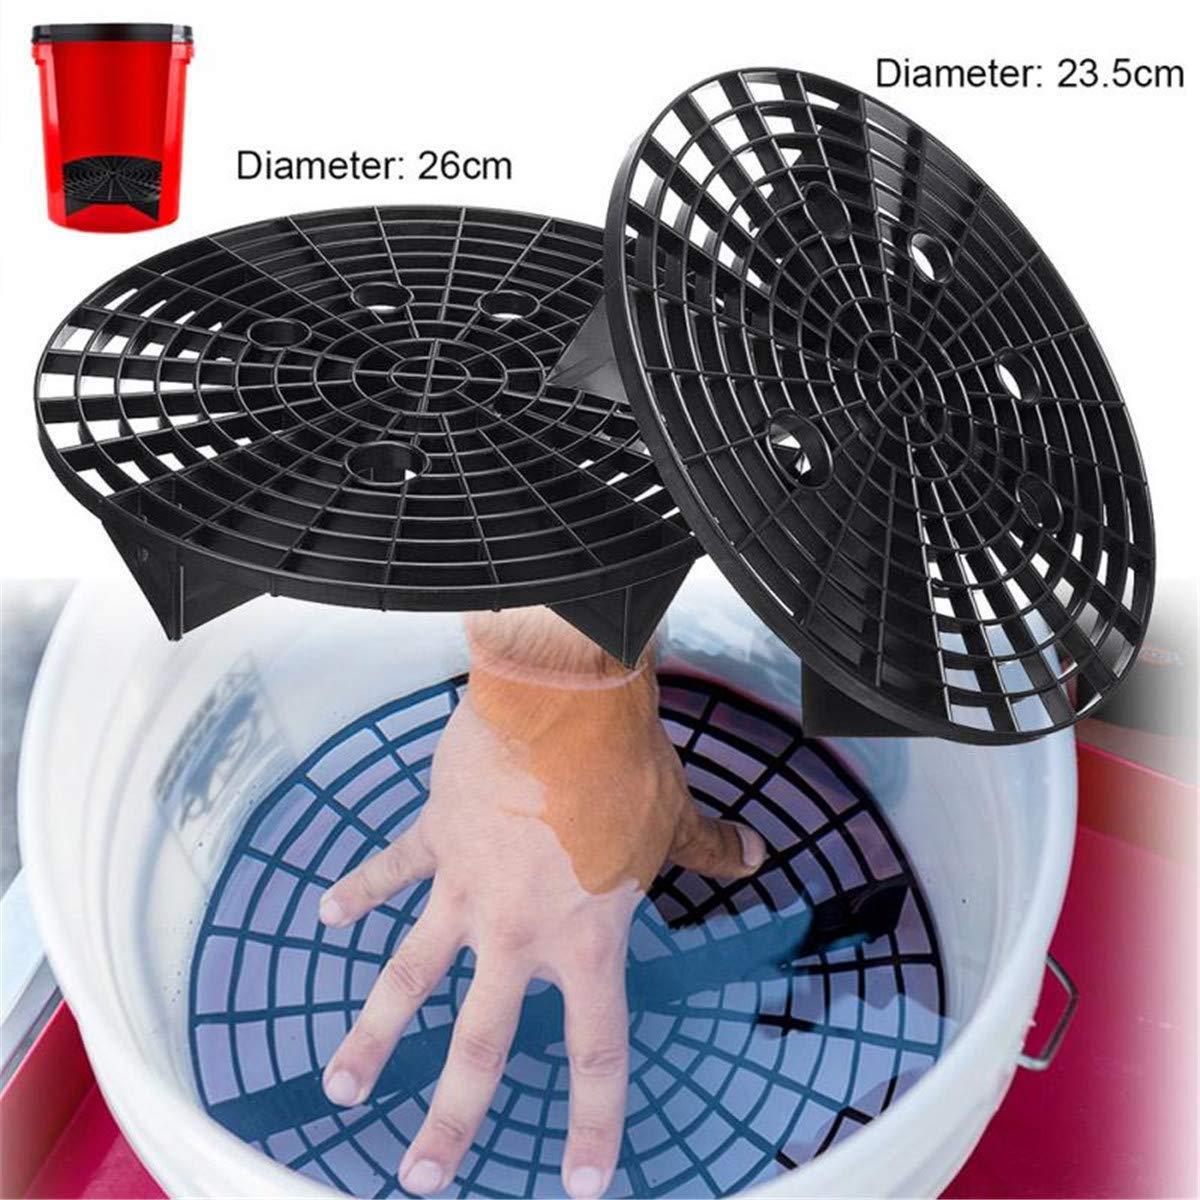 Cozylkx Grit Guard Insert Washboard Bucket Insert Separate Dirt for Car Wash Fit 23.5CM Diameter Bucket Black